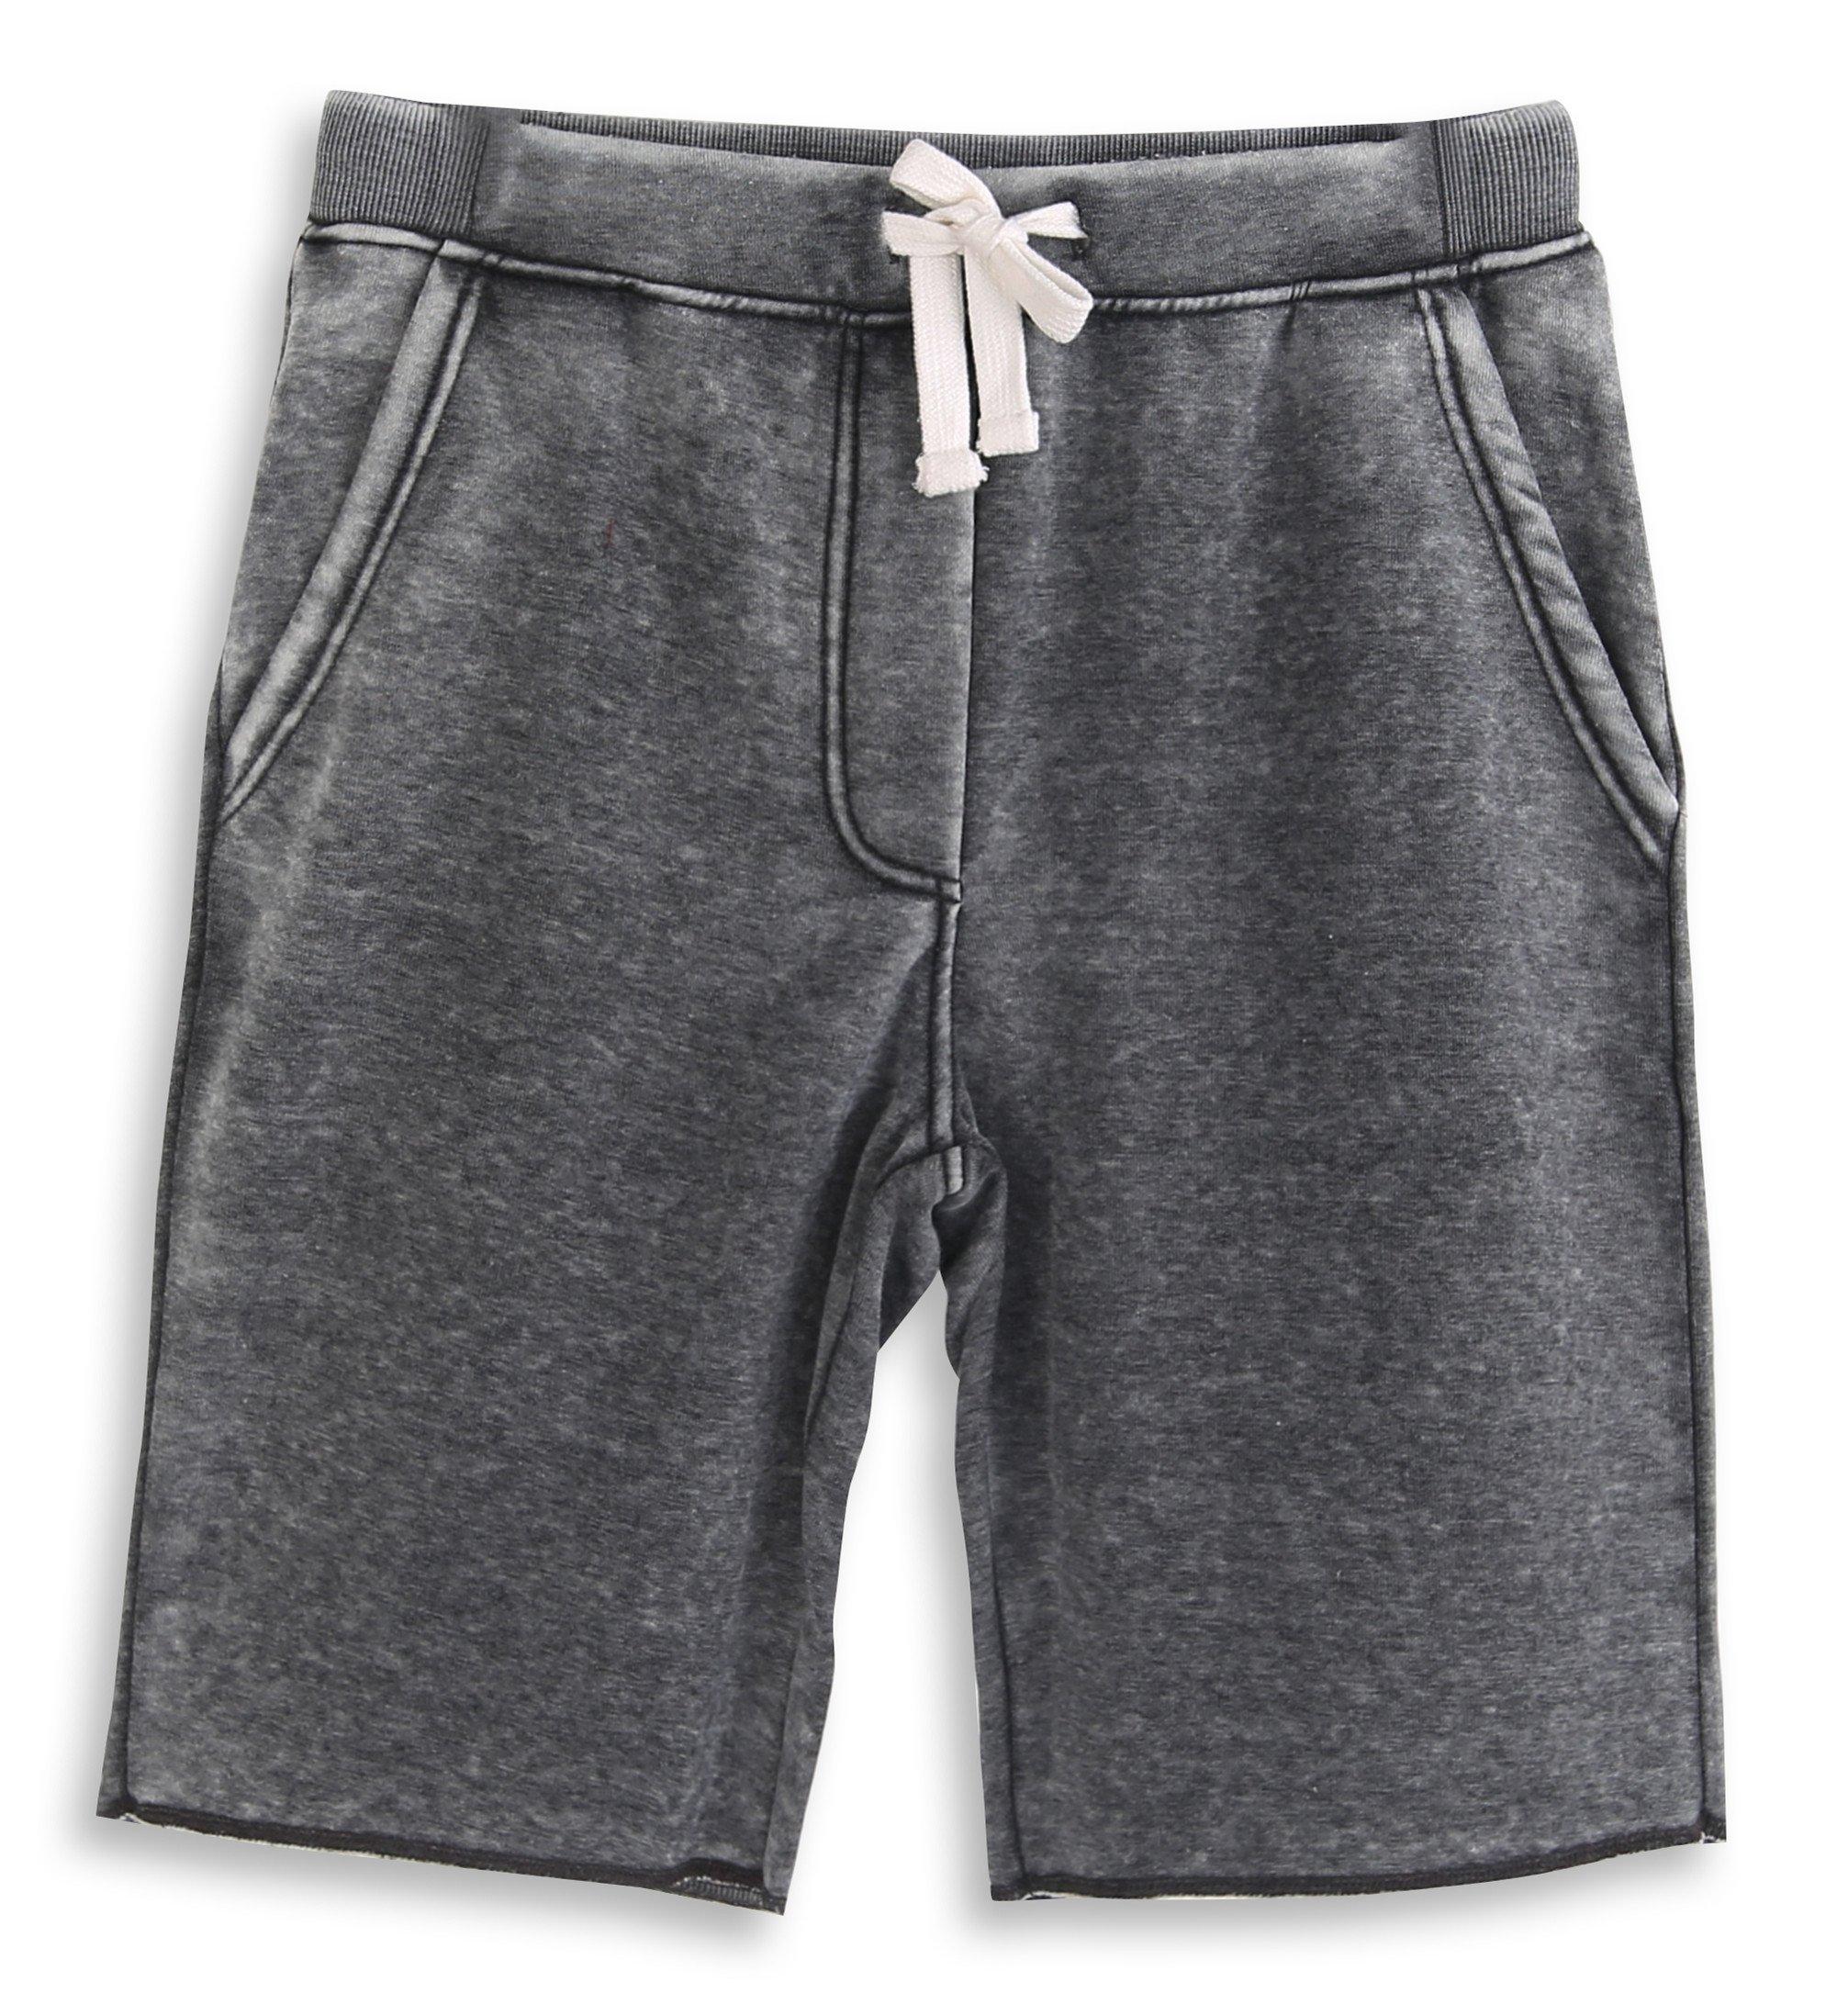 HARBETH Men's Casual Soft Cotton Elastic Fleece Jogger Gym Active Pocket Shorts Burnout Gray XL by HARBETH